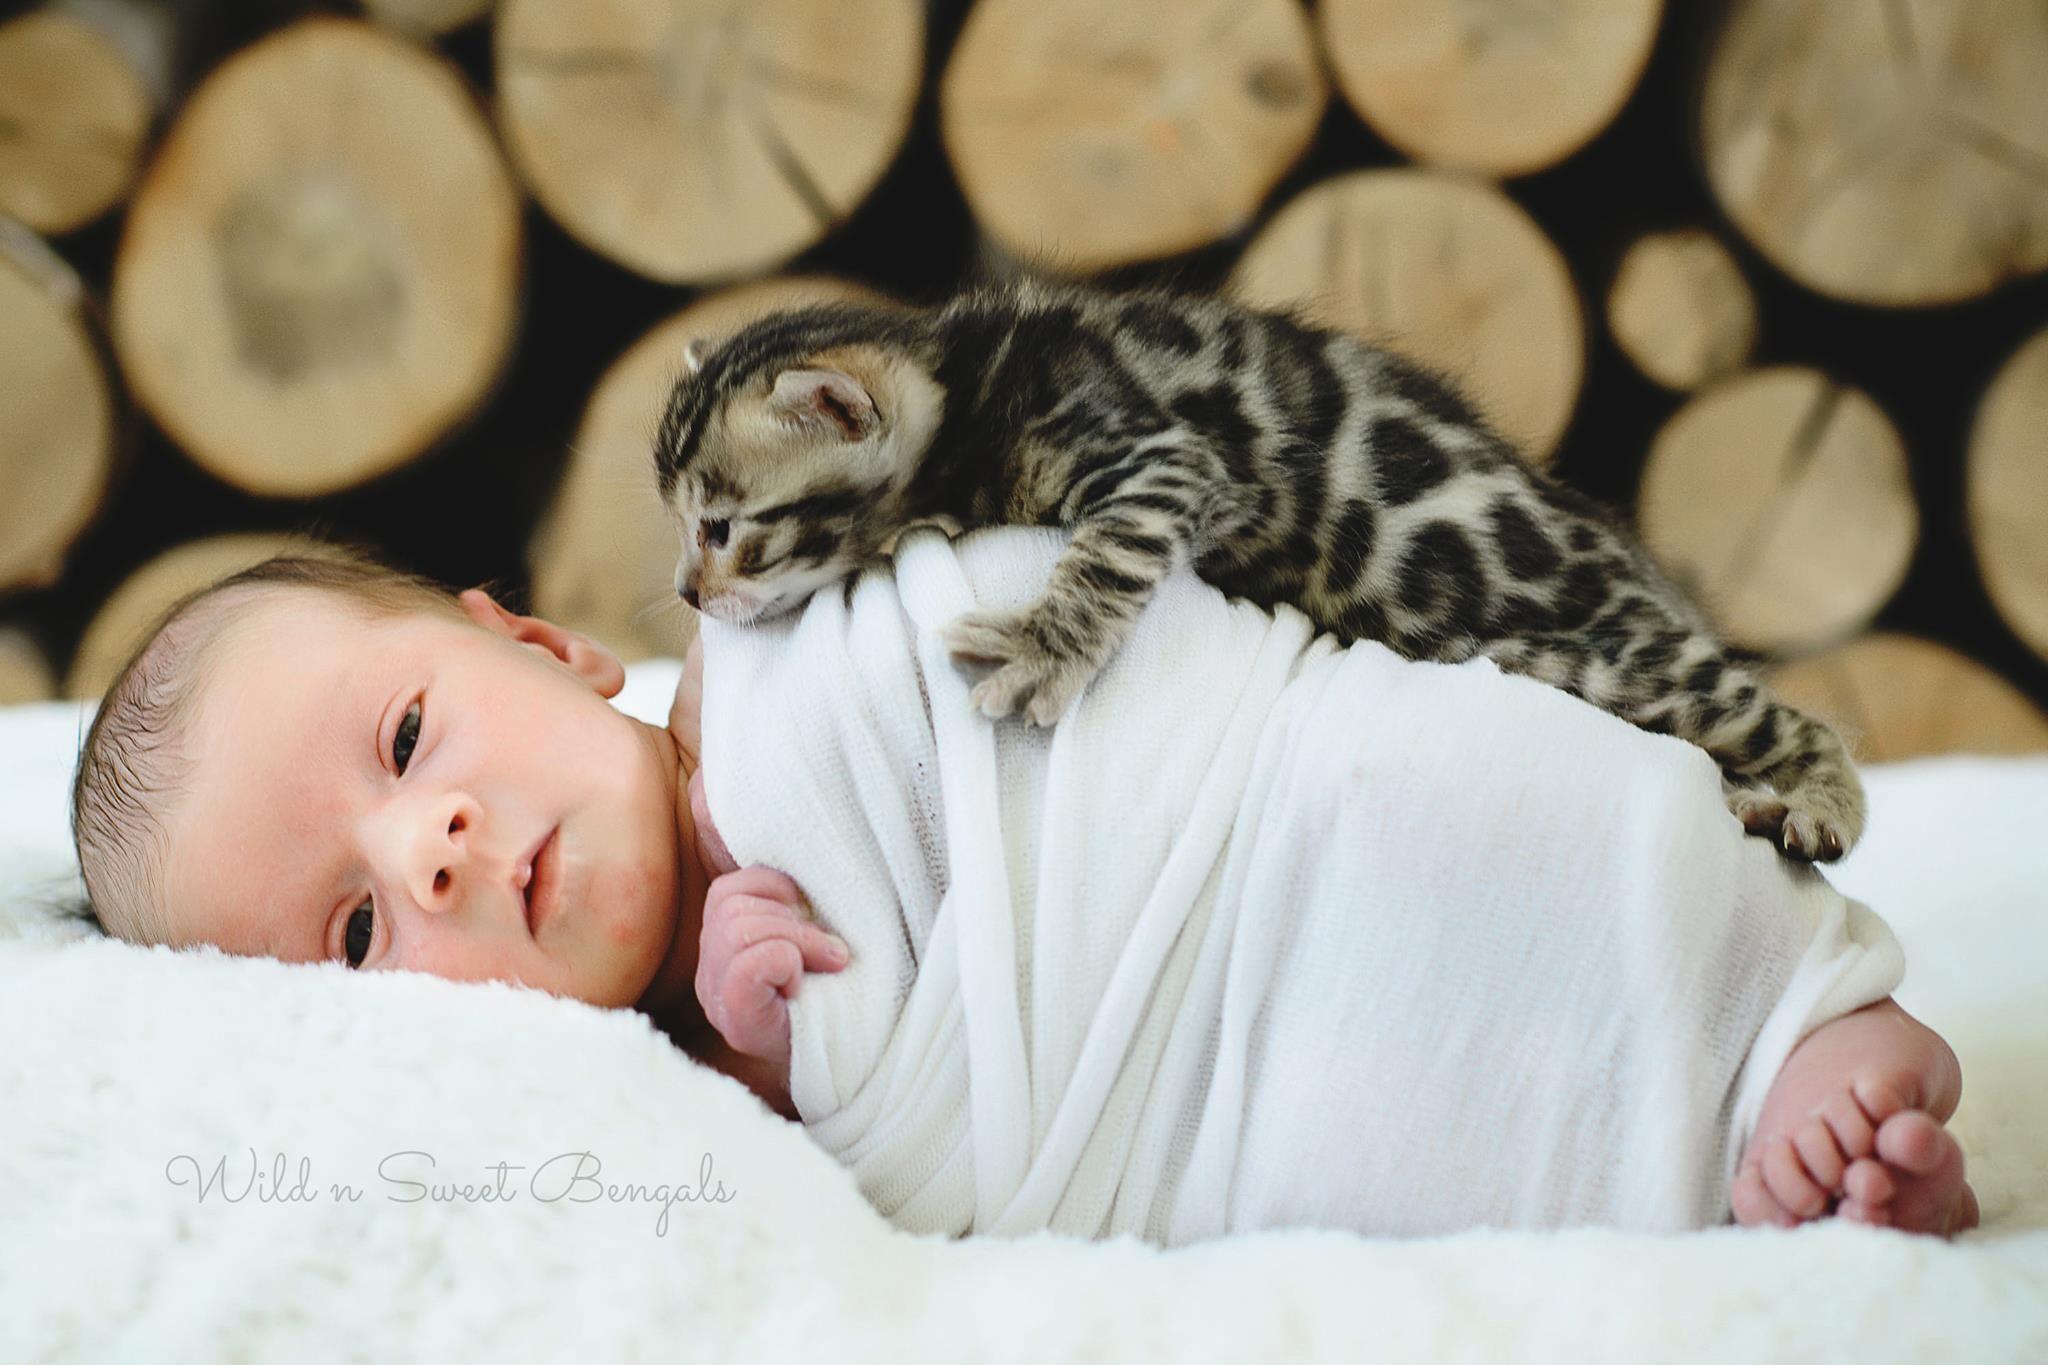 Sweetest Photo Ever Newborn Baby With A Newborn Bengal Kitten